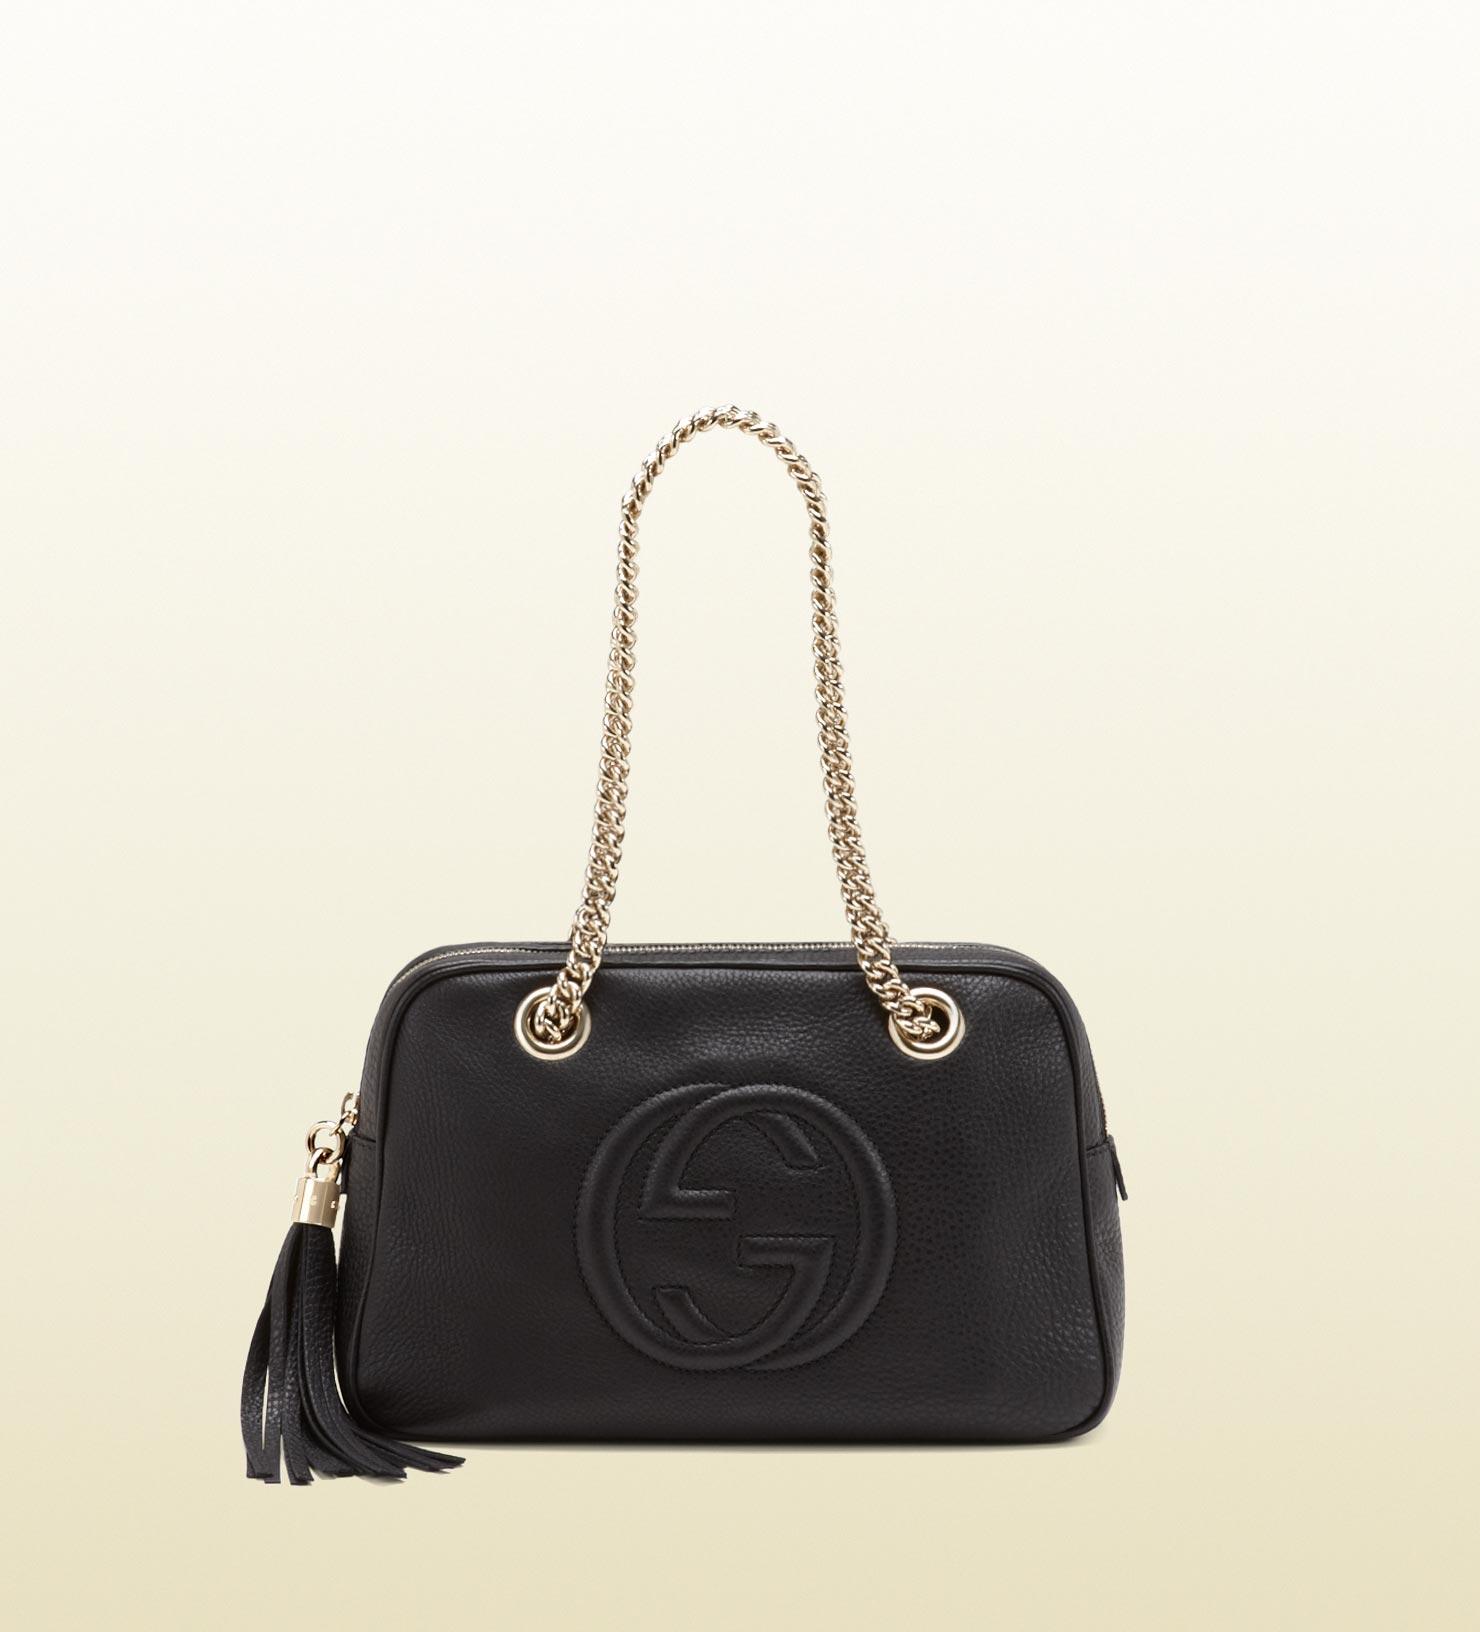 f76881f71323 Gucci Soho Leather Shoulder Bag in Black - Lyst